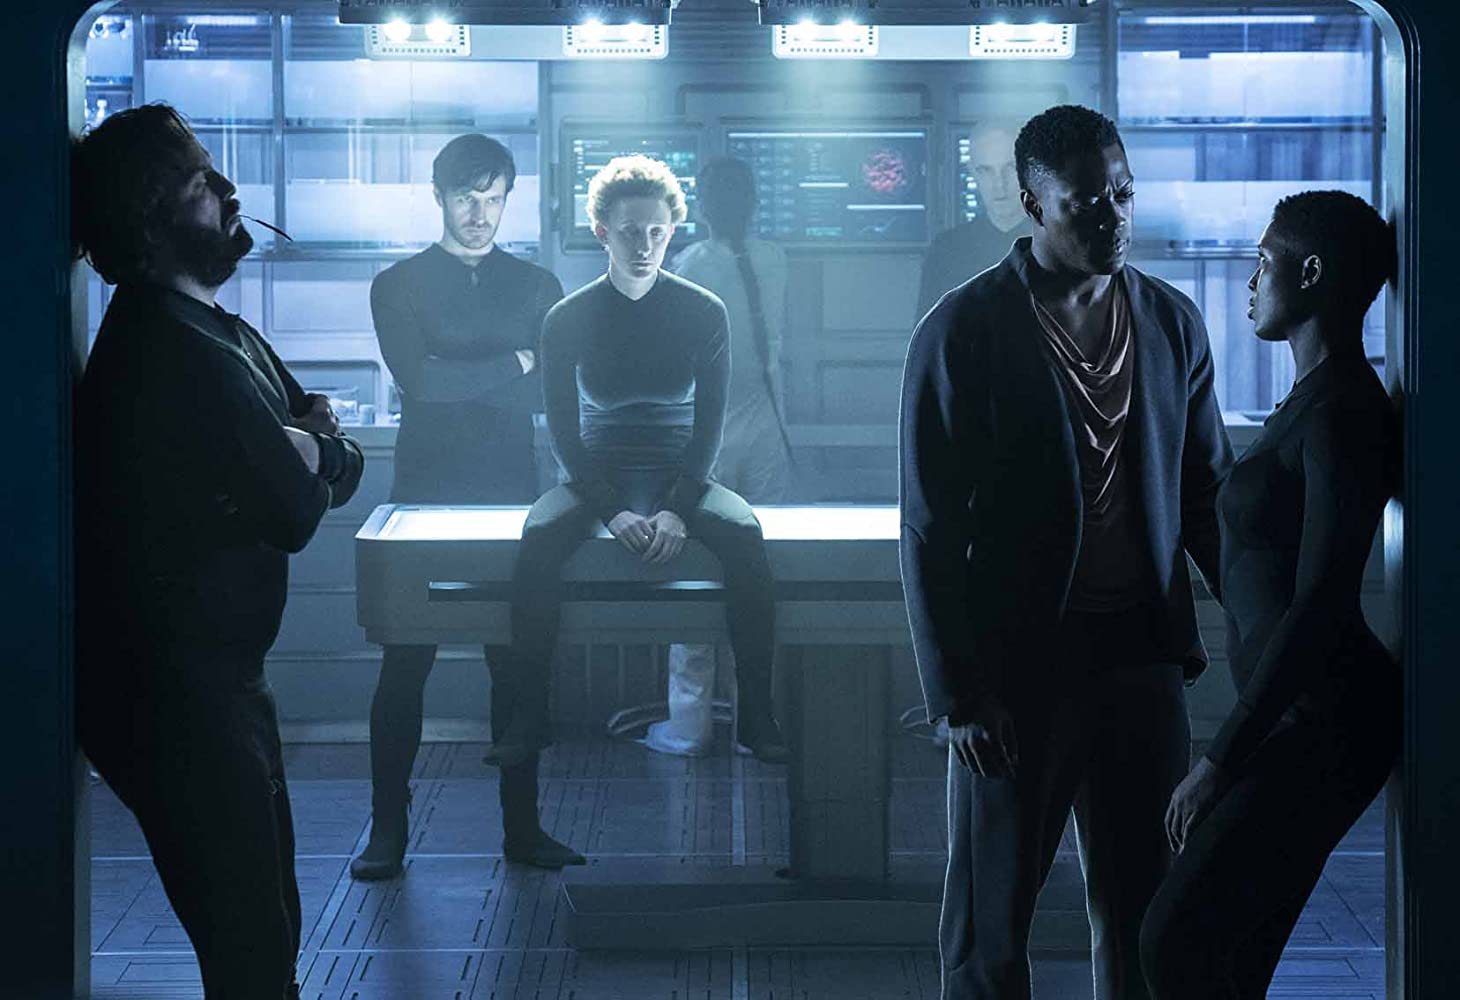 Angus Sampson, Maya Eshet, Eoin Macken, David Ajala, and Jodie Turner-Smith in Nightflyers (2018)